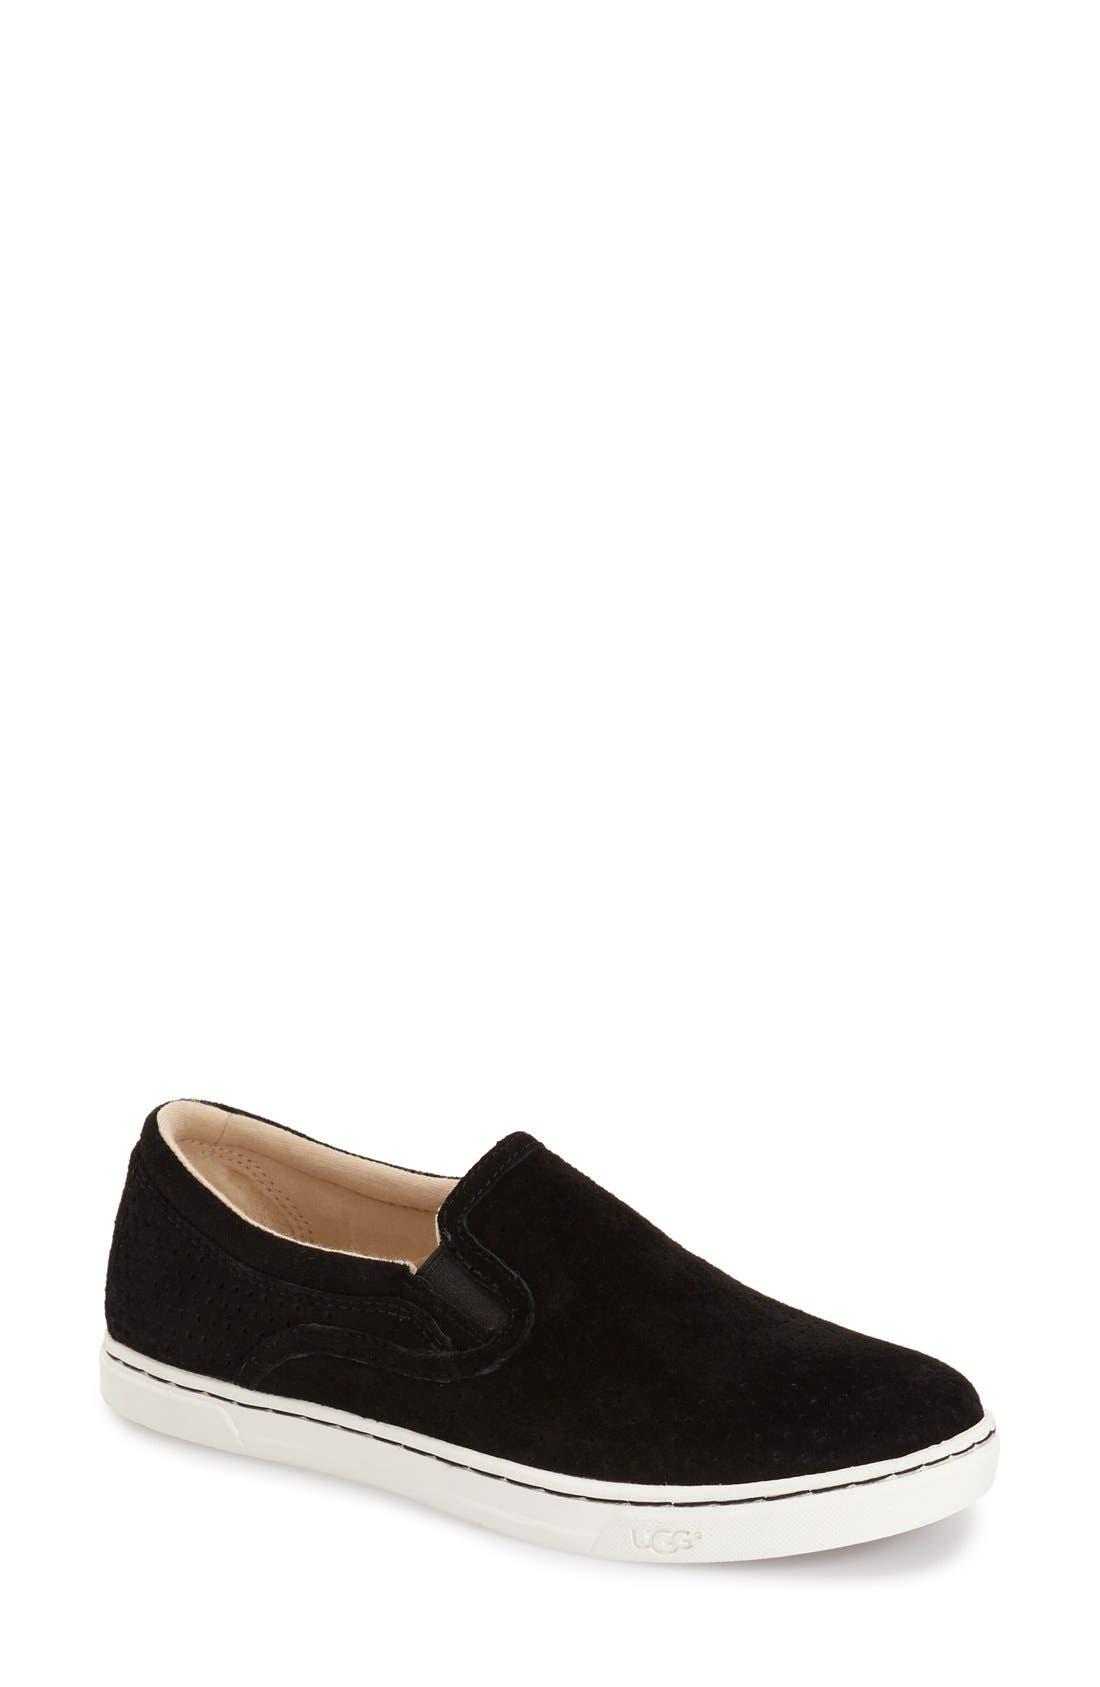 'Fierce Geo' Perforated Slip-On Sneaker,                             Main thumbnail 1, color,                             Black Suede